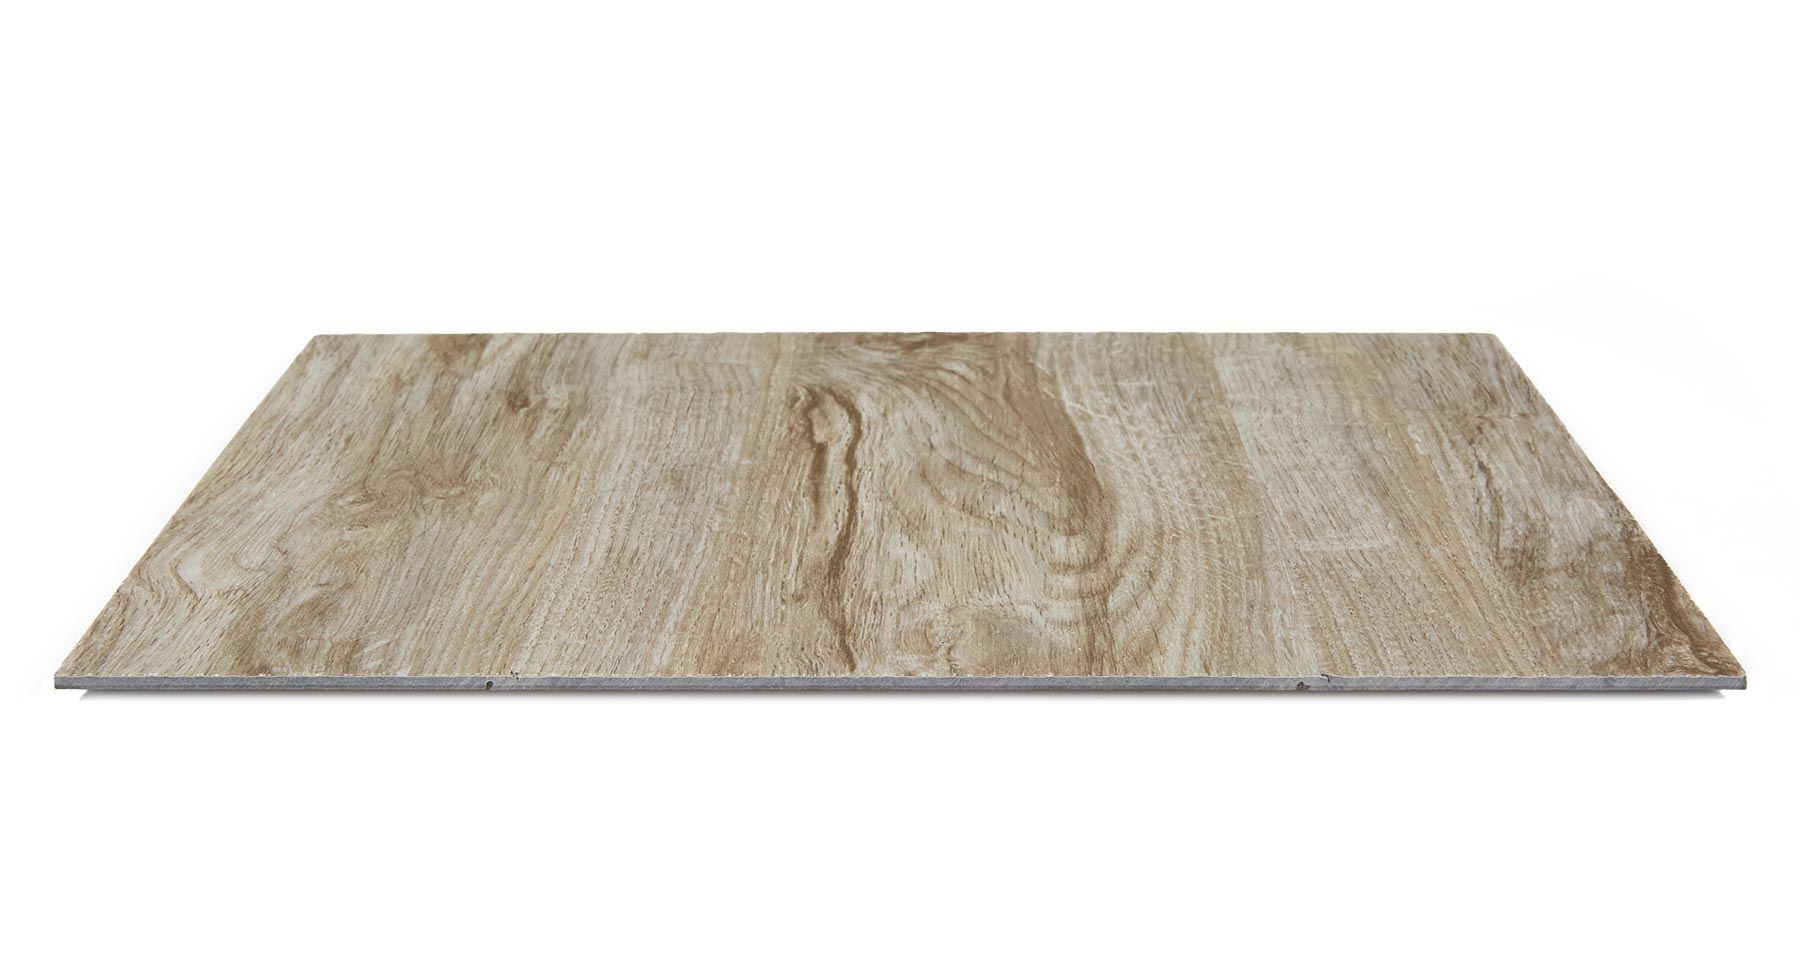 Vallette Luxury Vinyl Plank Flooring Vallette Series